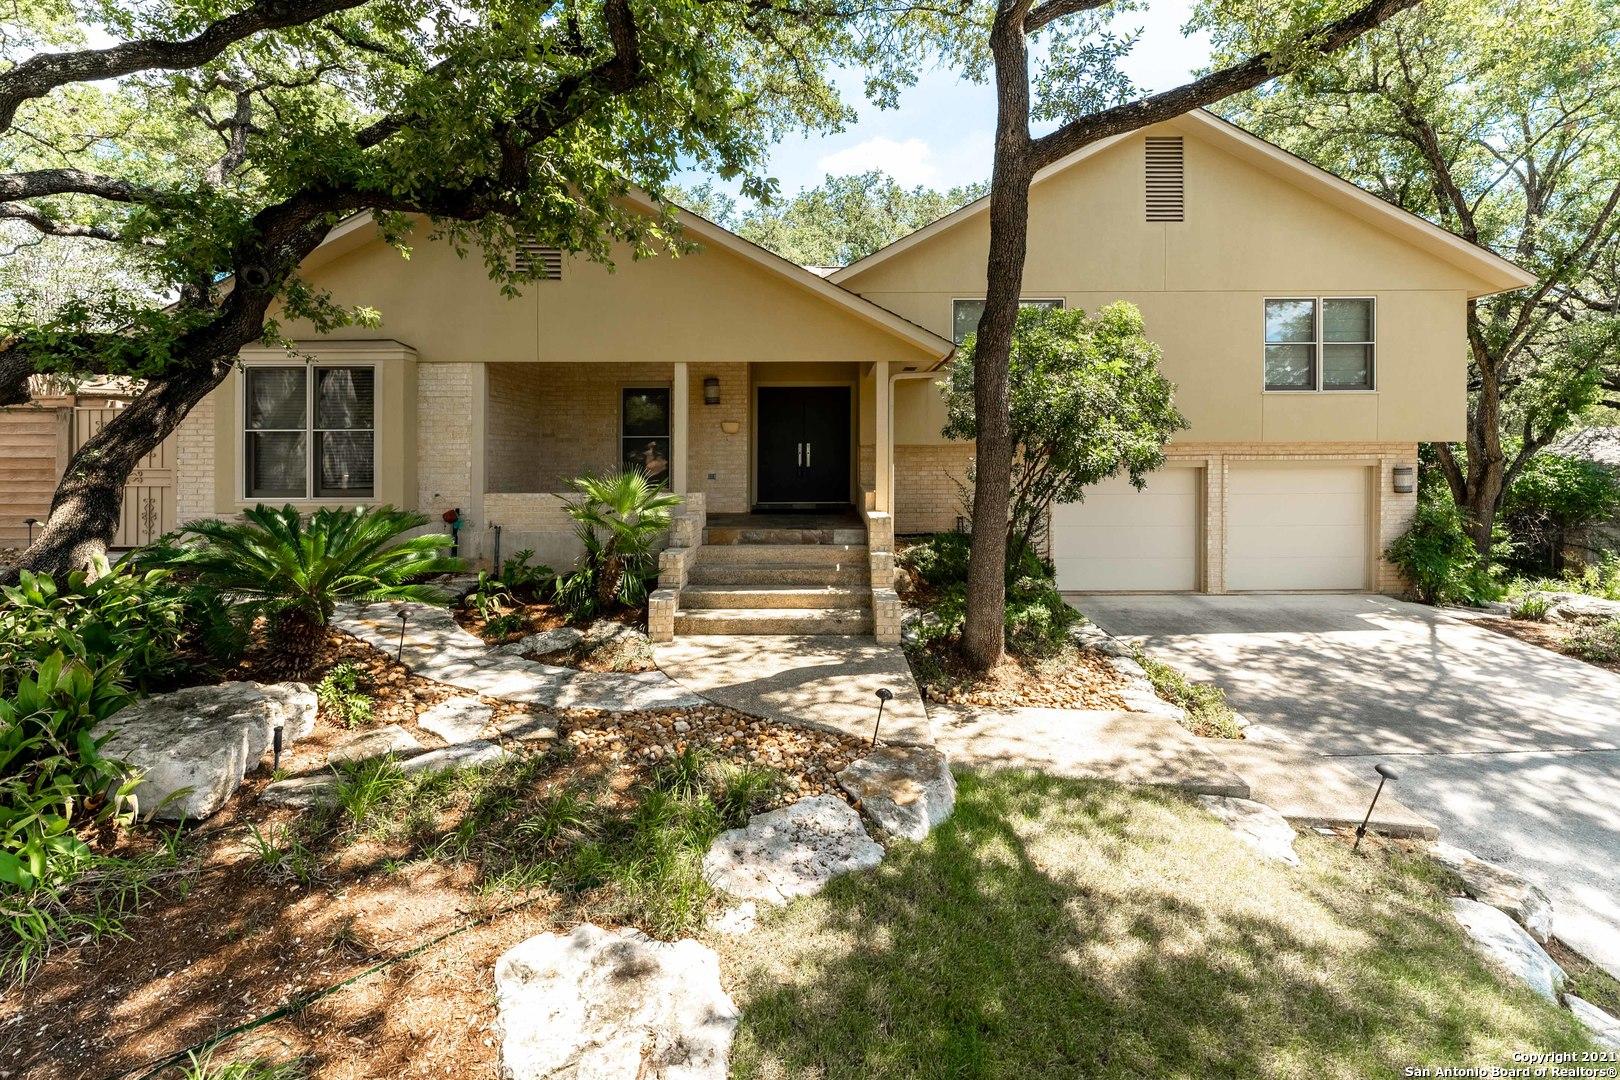 2803 WHISPER FAWN ST, San Antonio, TX 78230